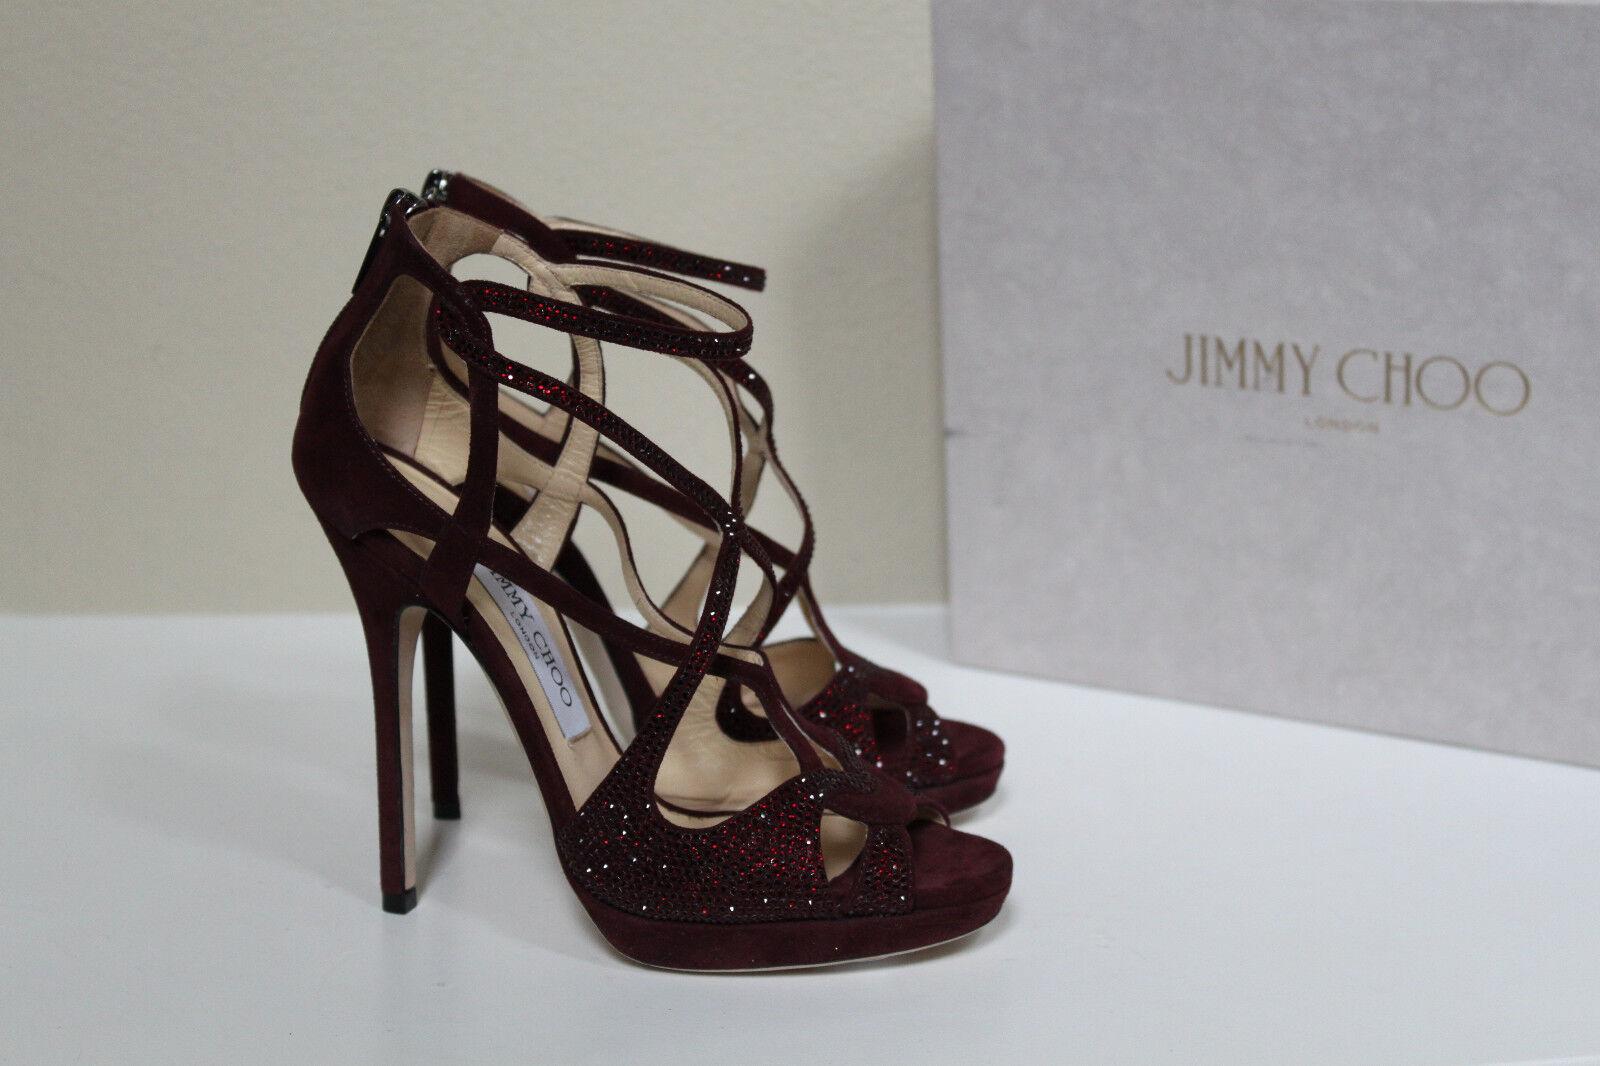 New sz 9.5 / 39.5 Jimmy Choo Vault Crystal Burgundy Suede Cage Sandal Pump Shoes